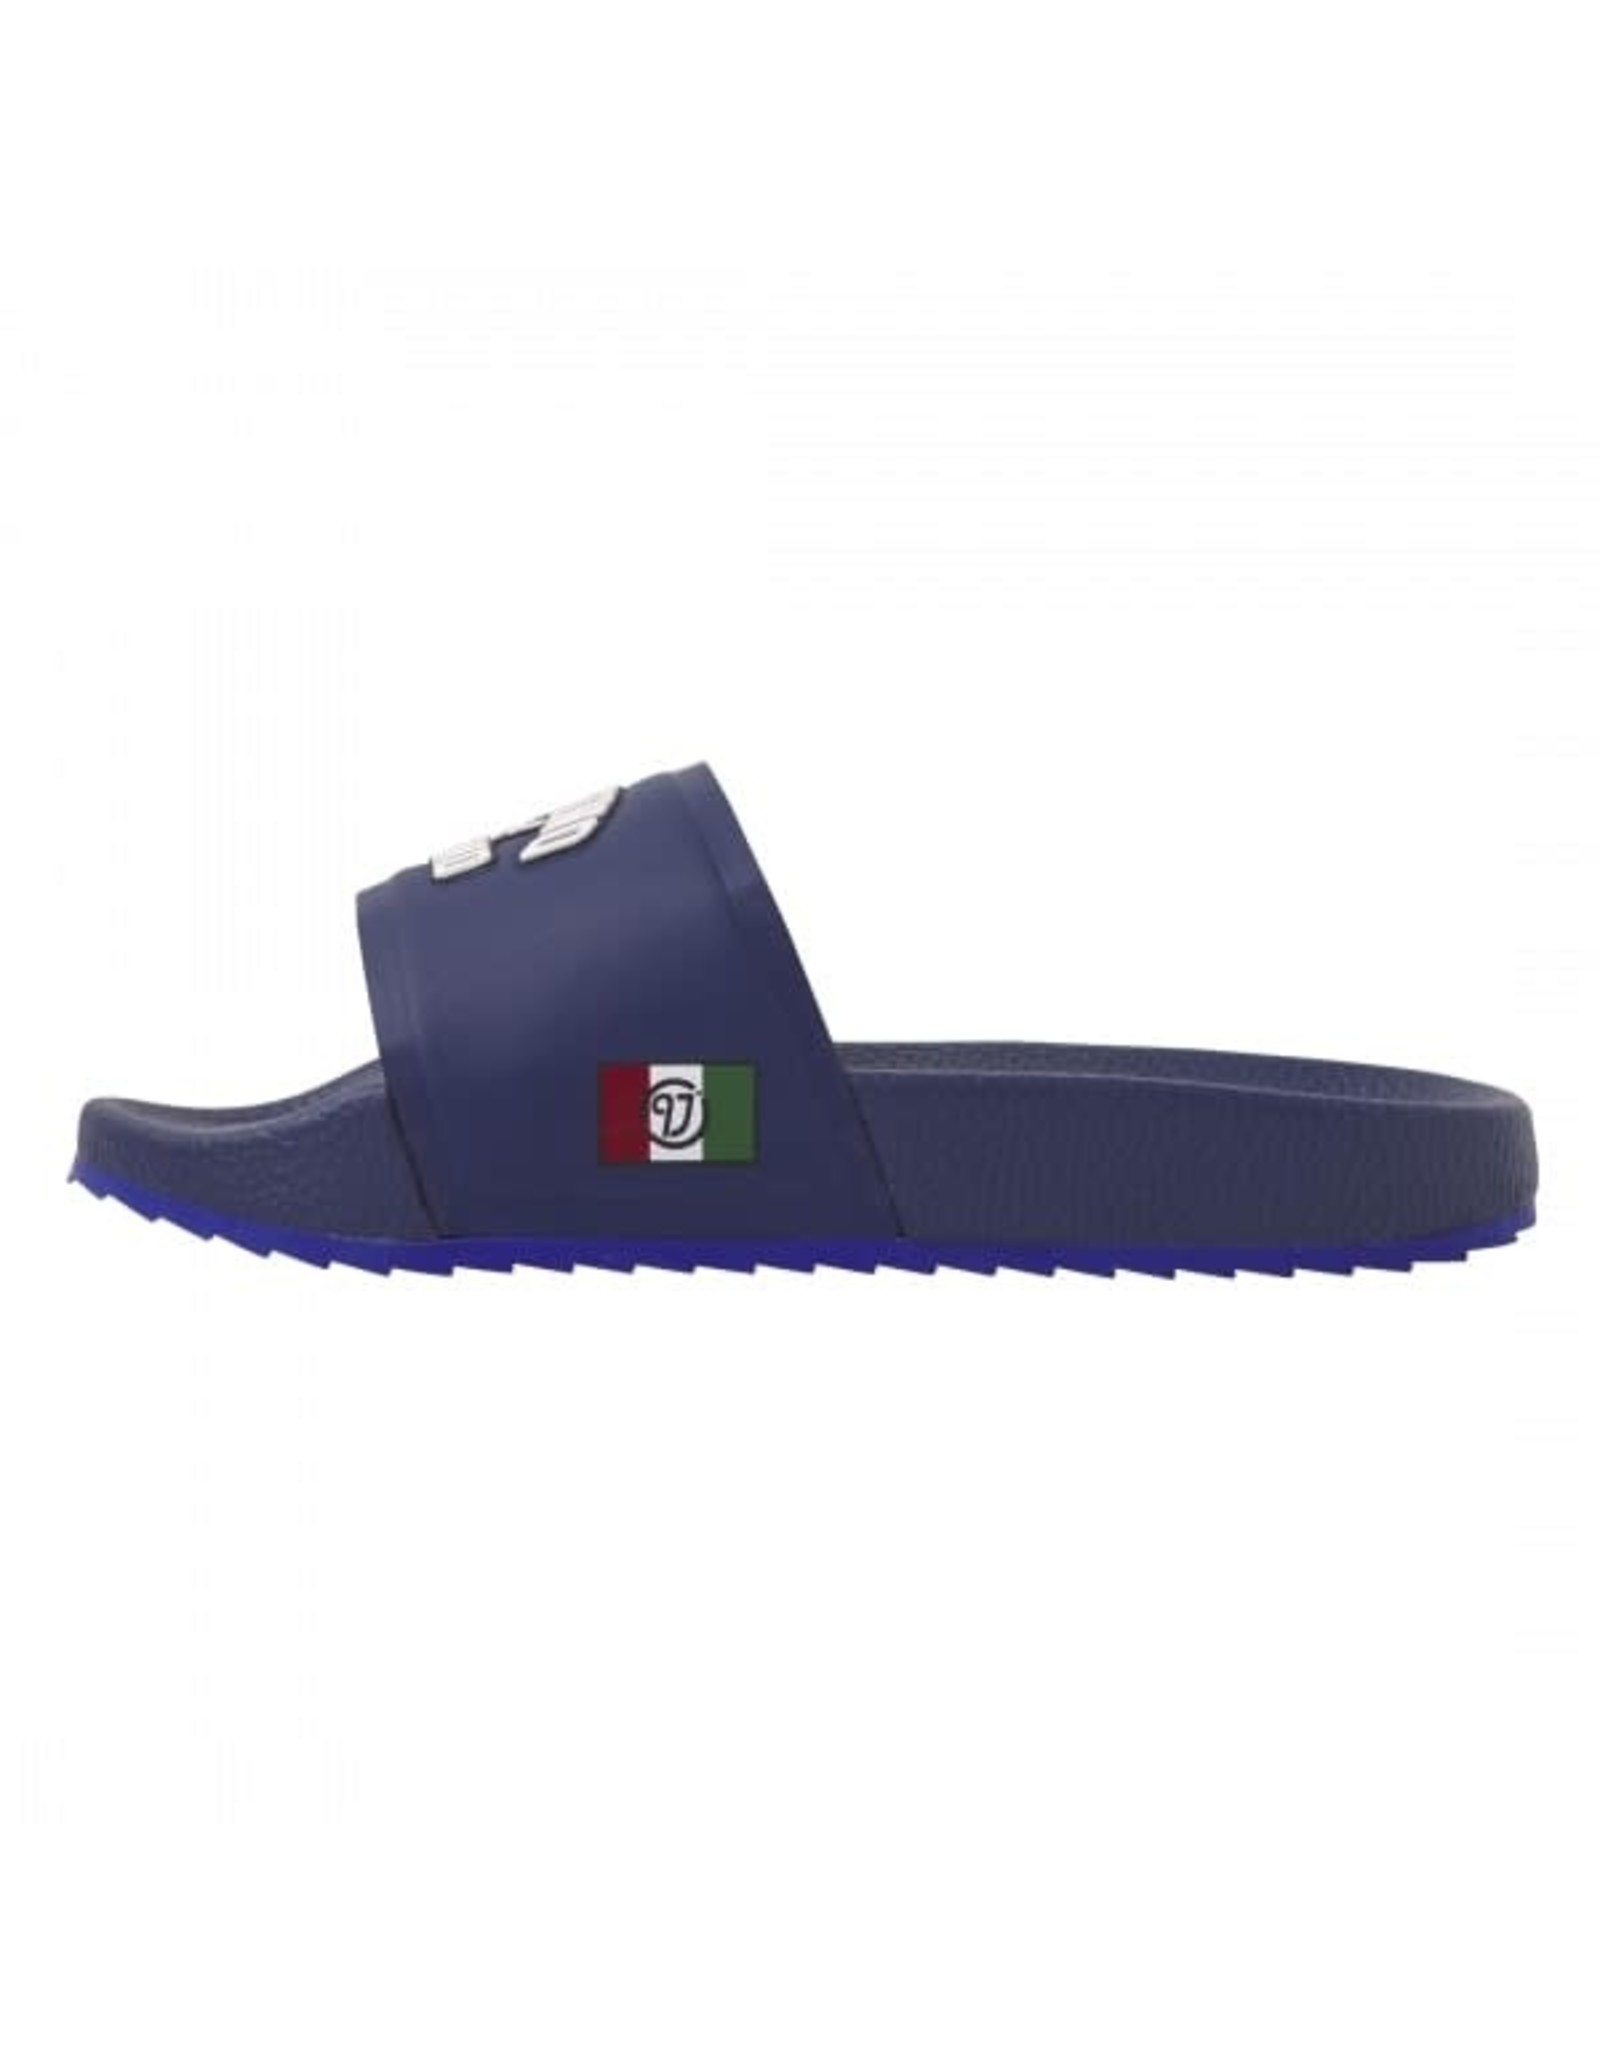 Vingino Vingino jongens slippers Vico Azure Blue